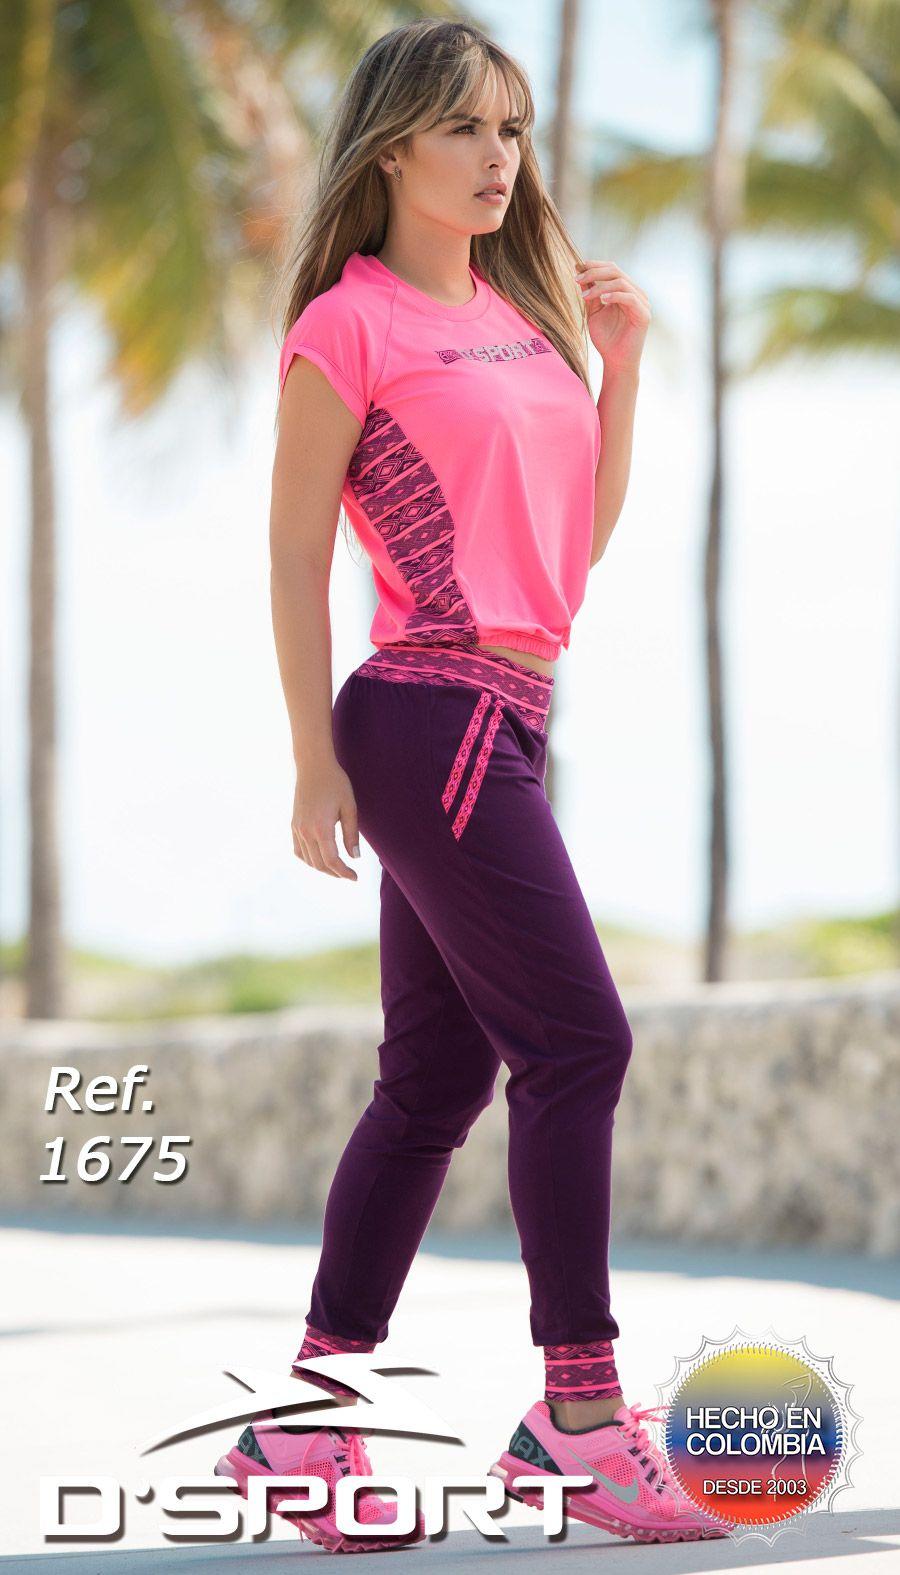 5bcf5a82fd0af 1675 ROPA DEPORTIVA MUJER - SKA Studio Moda Deportiva Para Mujer